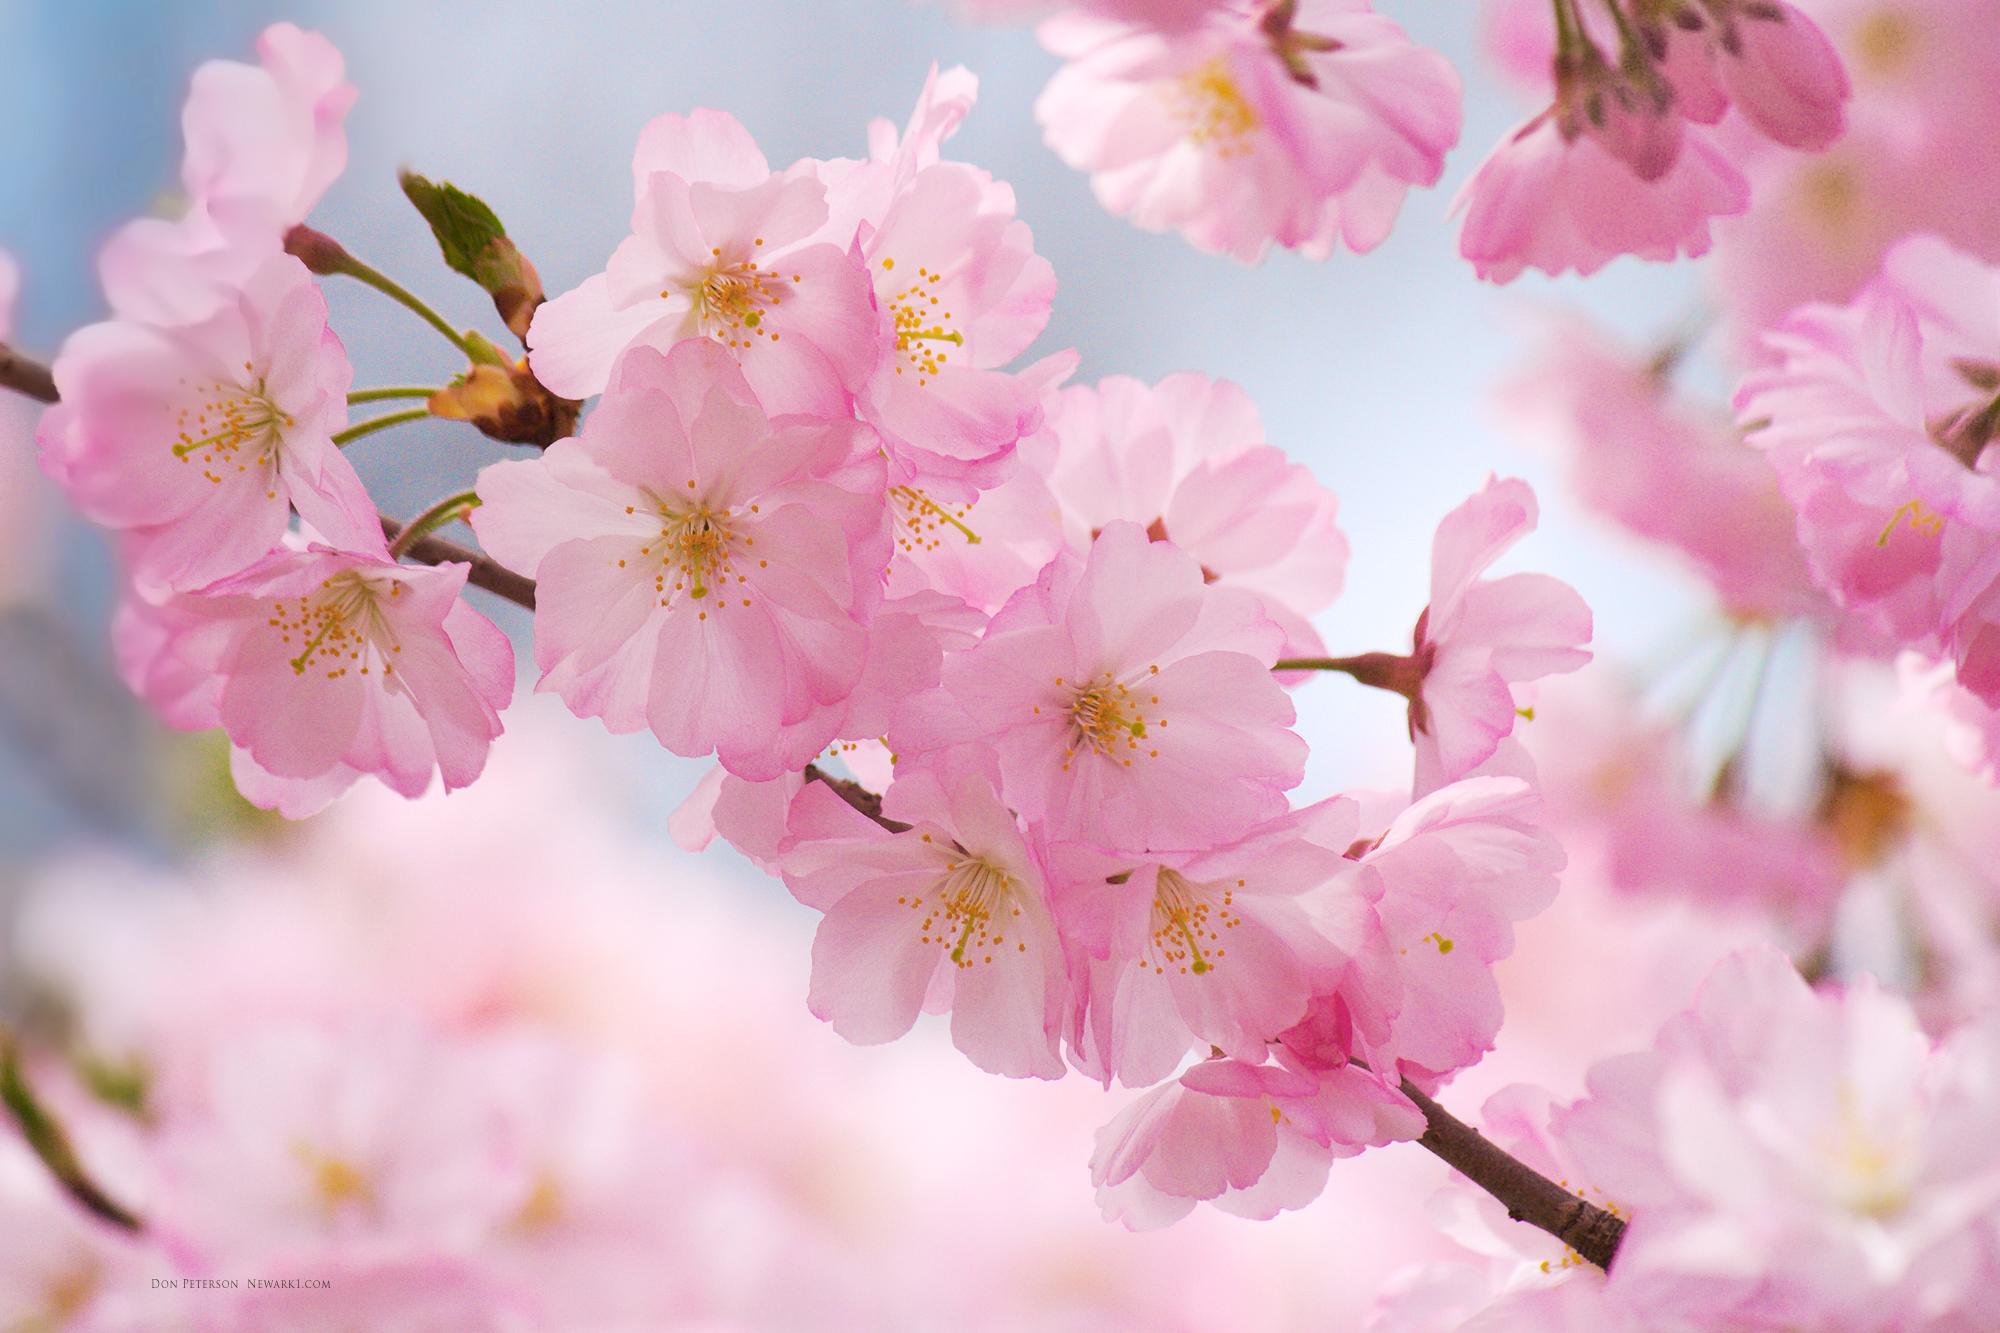 cherry-blossoms-wallpaper-1.jpg